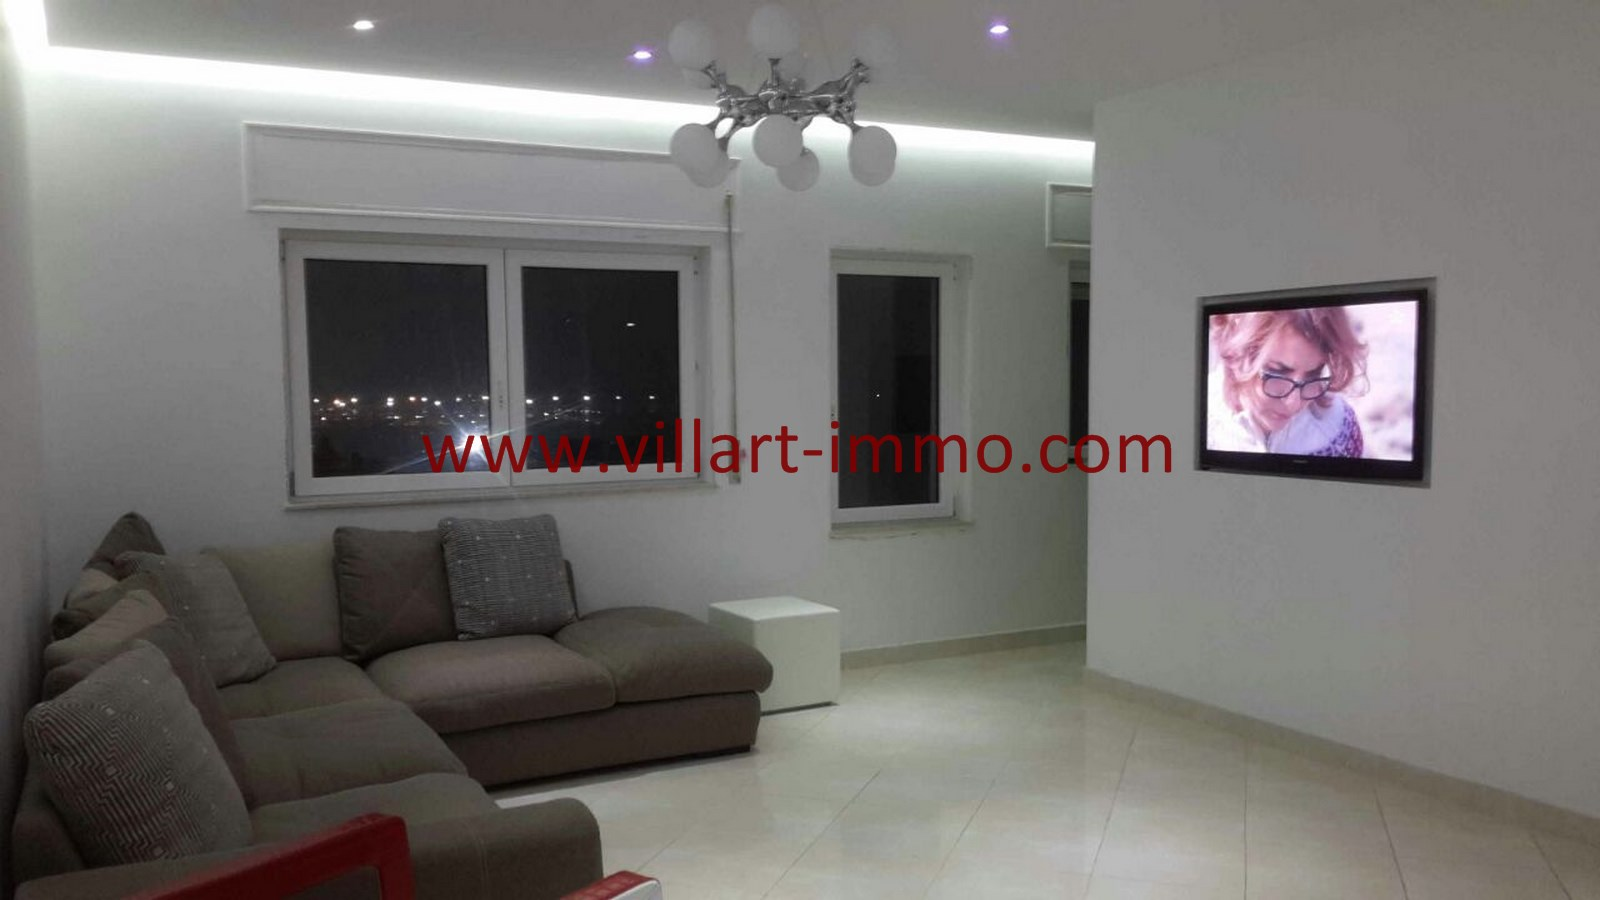 4-Vente-Appartement-Tanger-Malabata-Salon 3-VA490-Villart Immo (Copier)